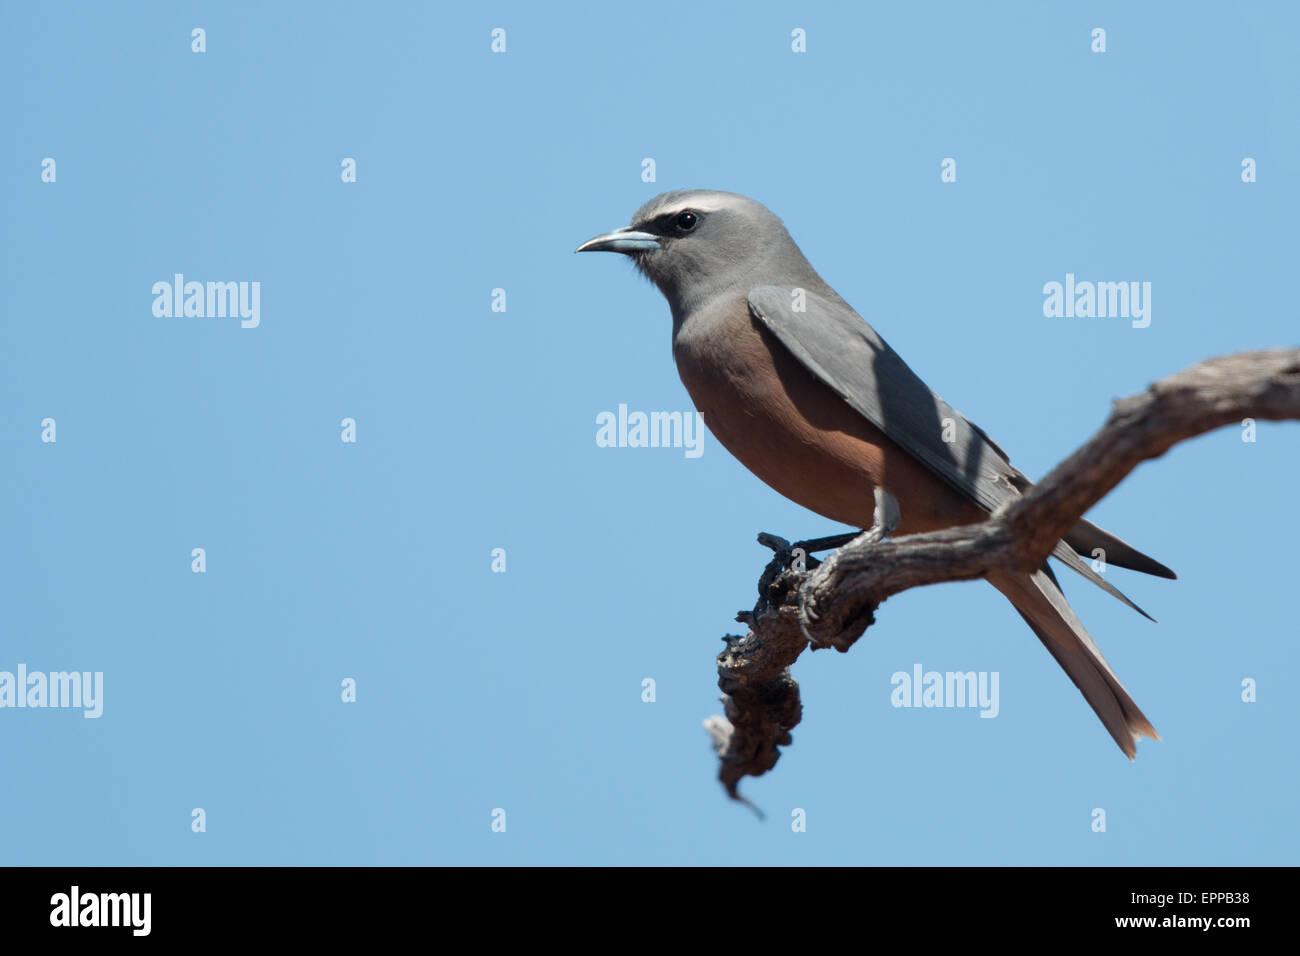 White-browed Woodswallow (Artamus superciliosus) - Stock Image